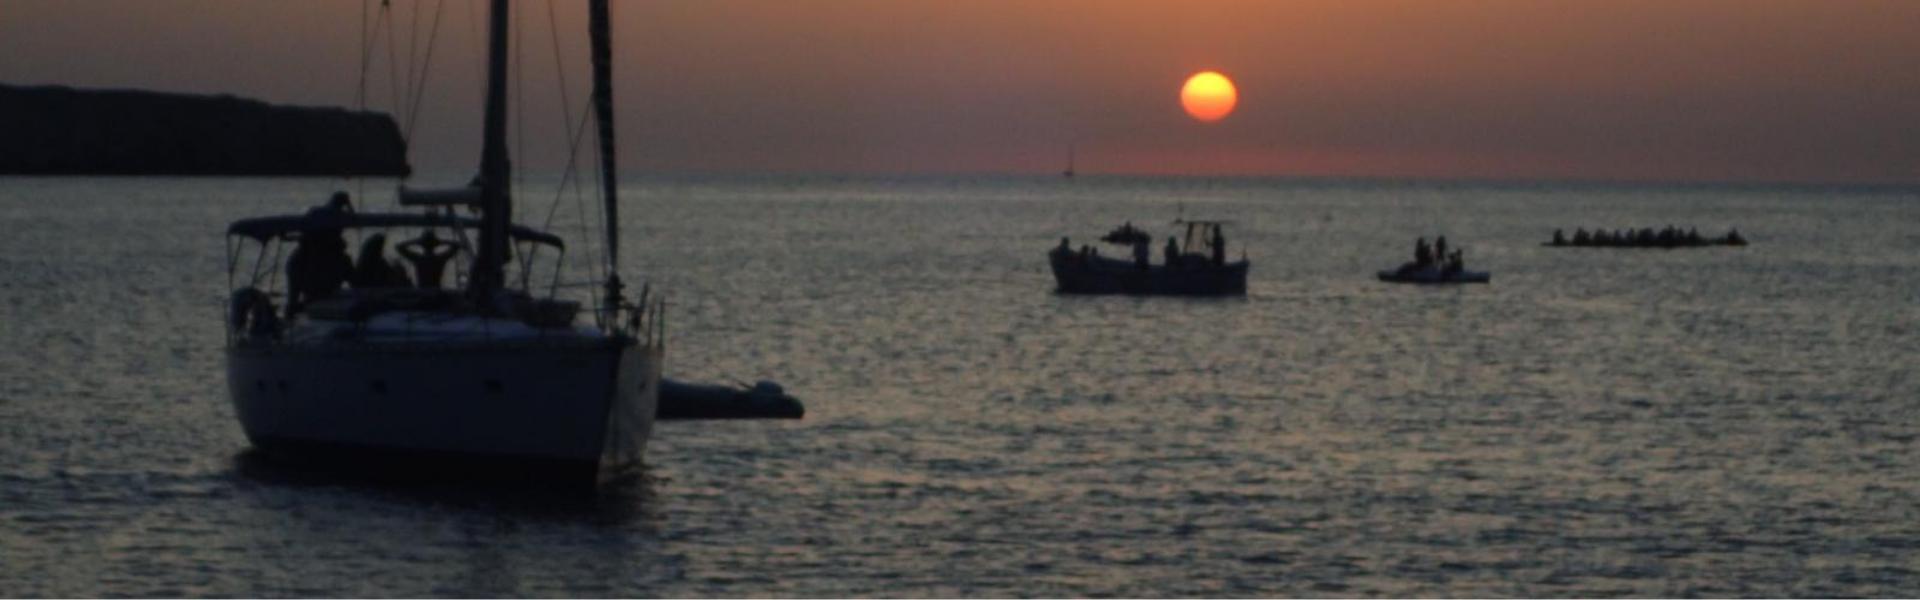 Velero Ibiza Sunset